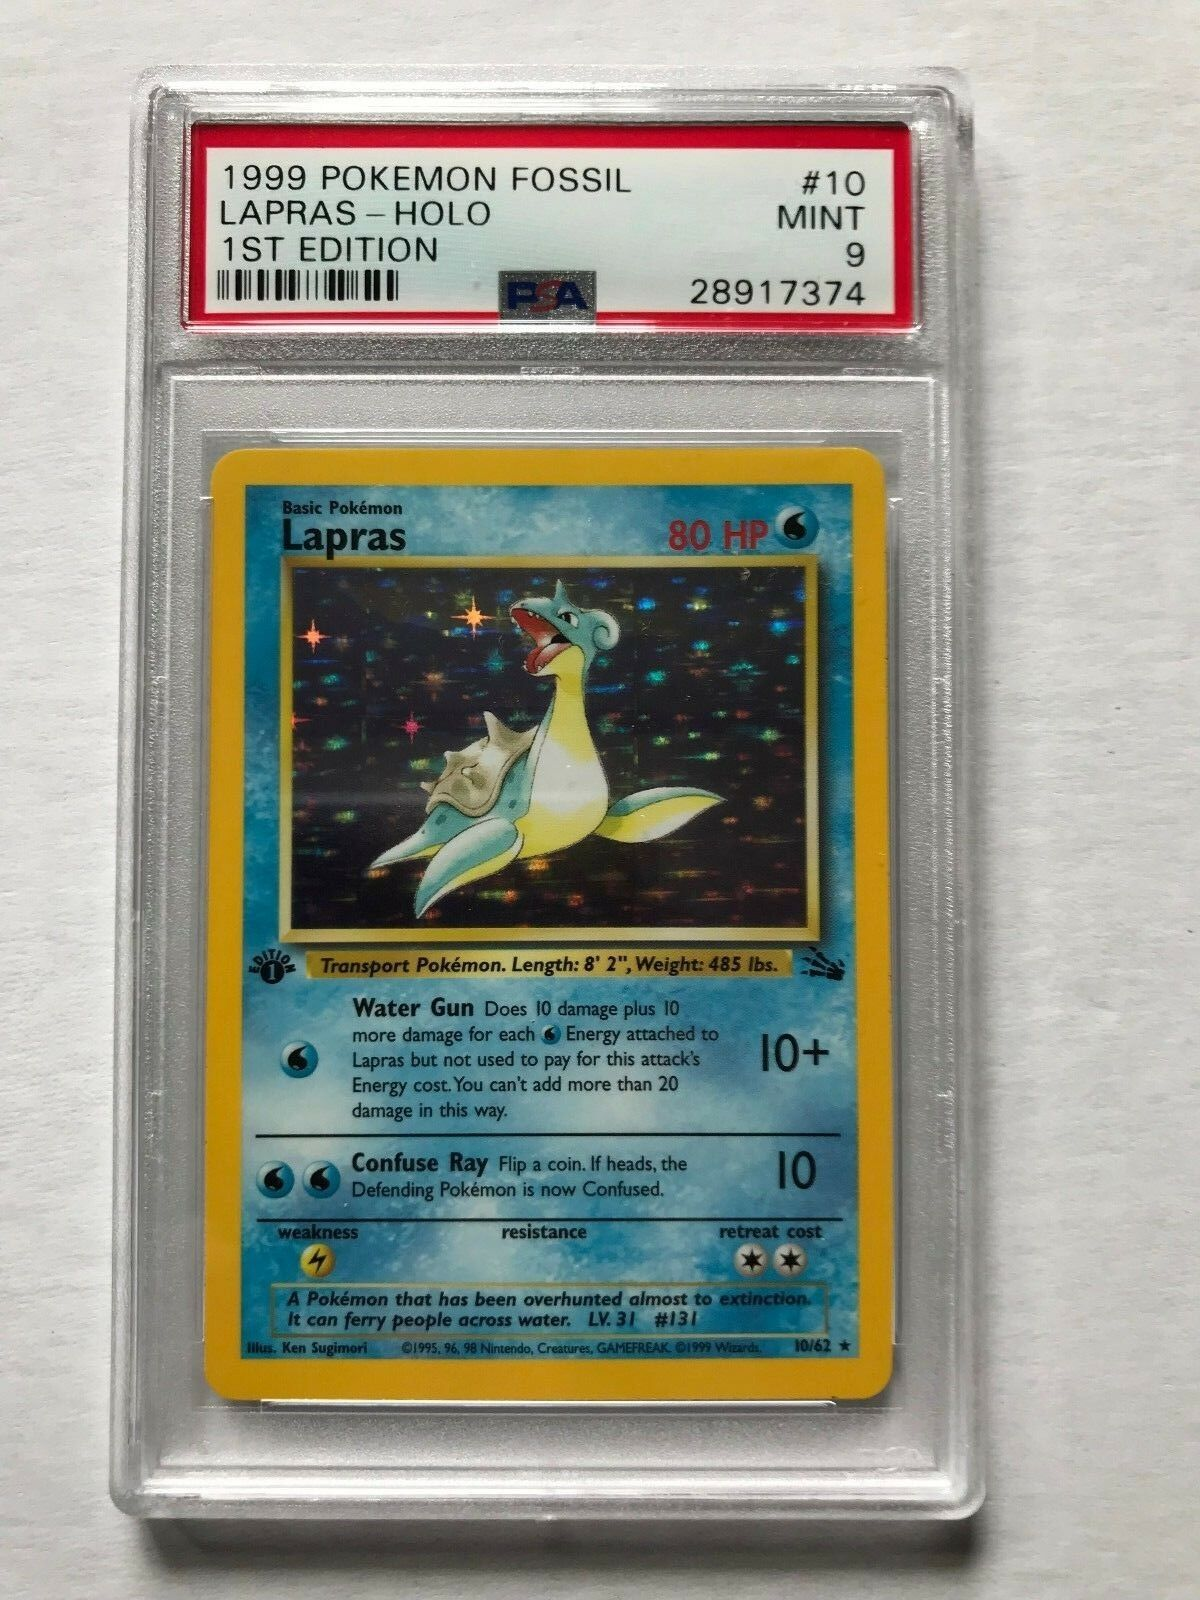 1999 Pokemon Card 1st Edition Lapras Holo Foil Fossil Graded PSA 9 Mint